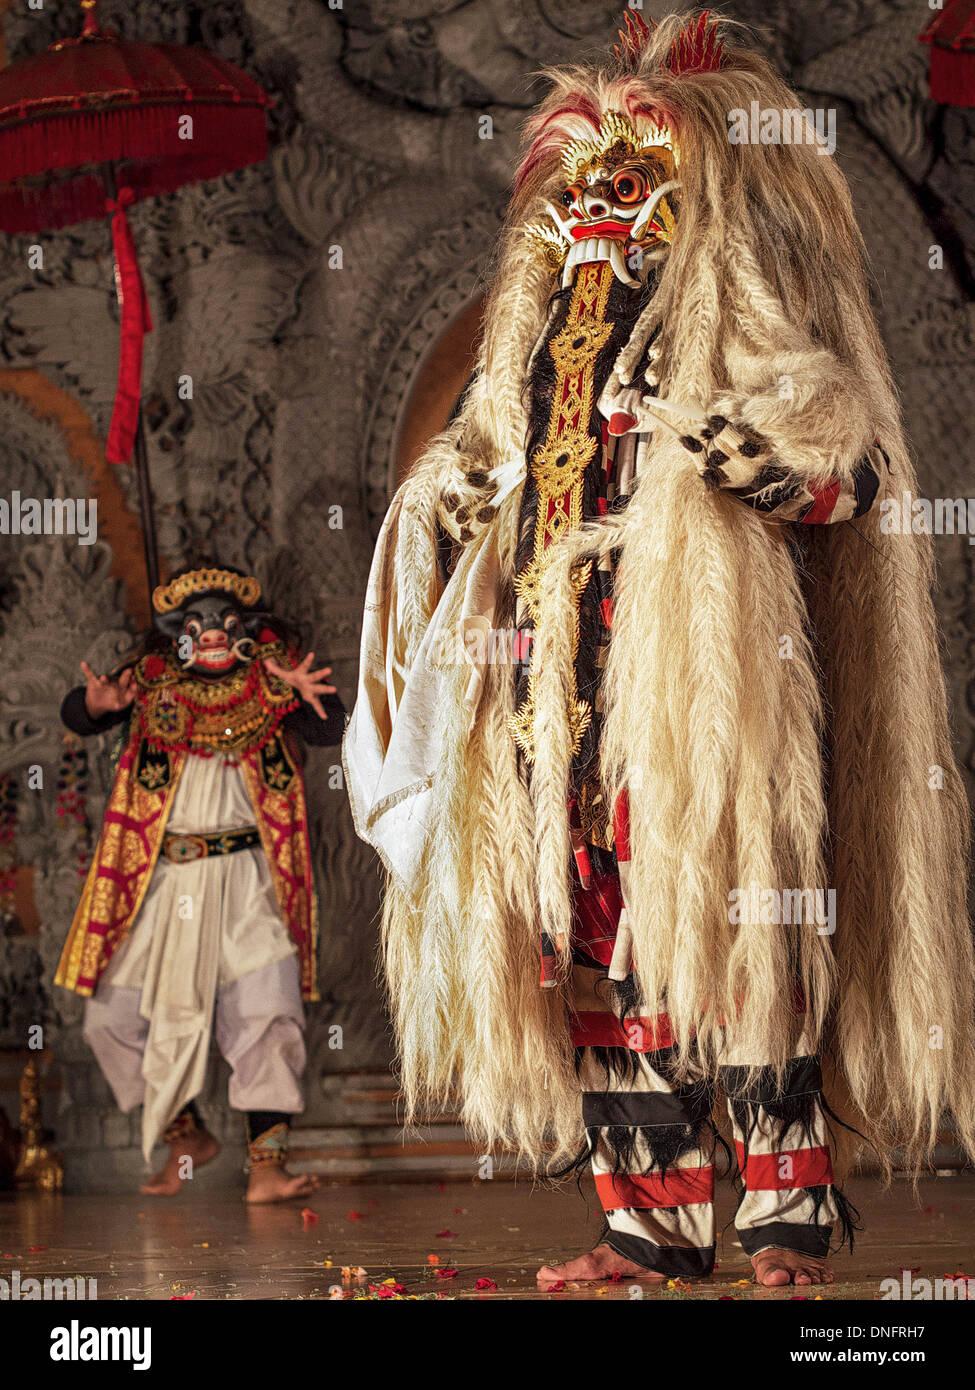 Representation of Rangda in traditional Balinese Barong Dance performance in Ubud, Bali, Indonesia. - Stock Image